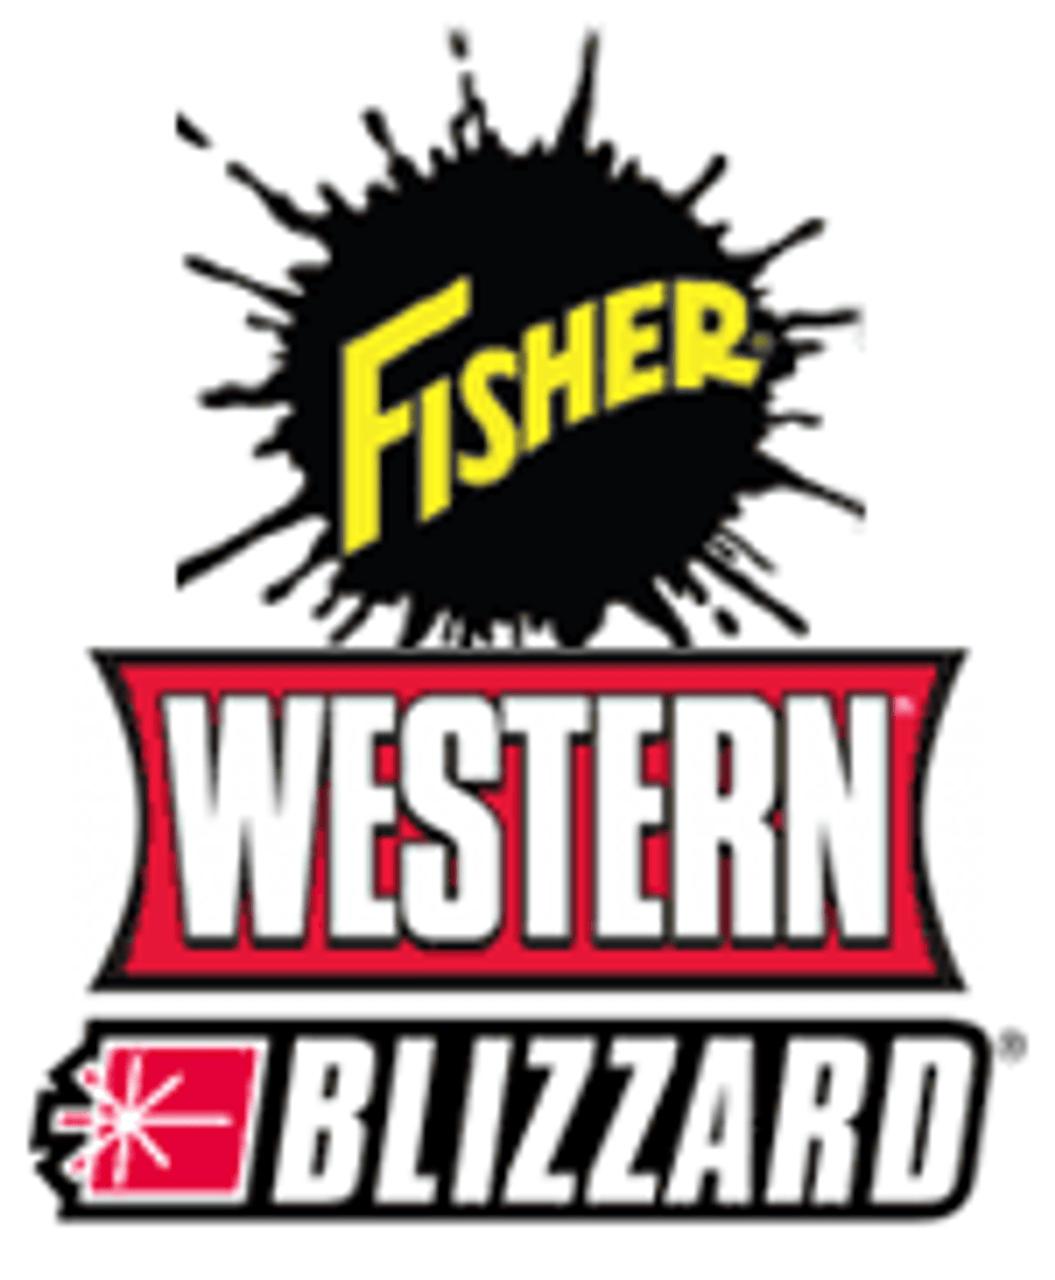 29400-5 - FISHER - WESTERN - BLIZZARD - SNOWEX PLUG-IN HARNESS KIT HB3/H11